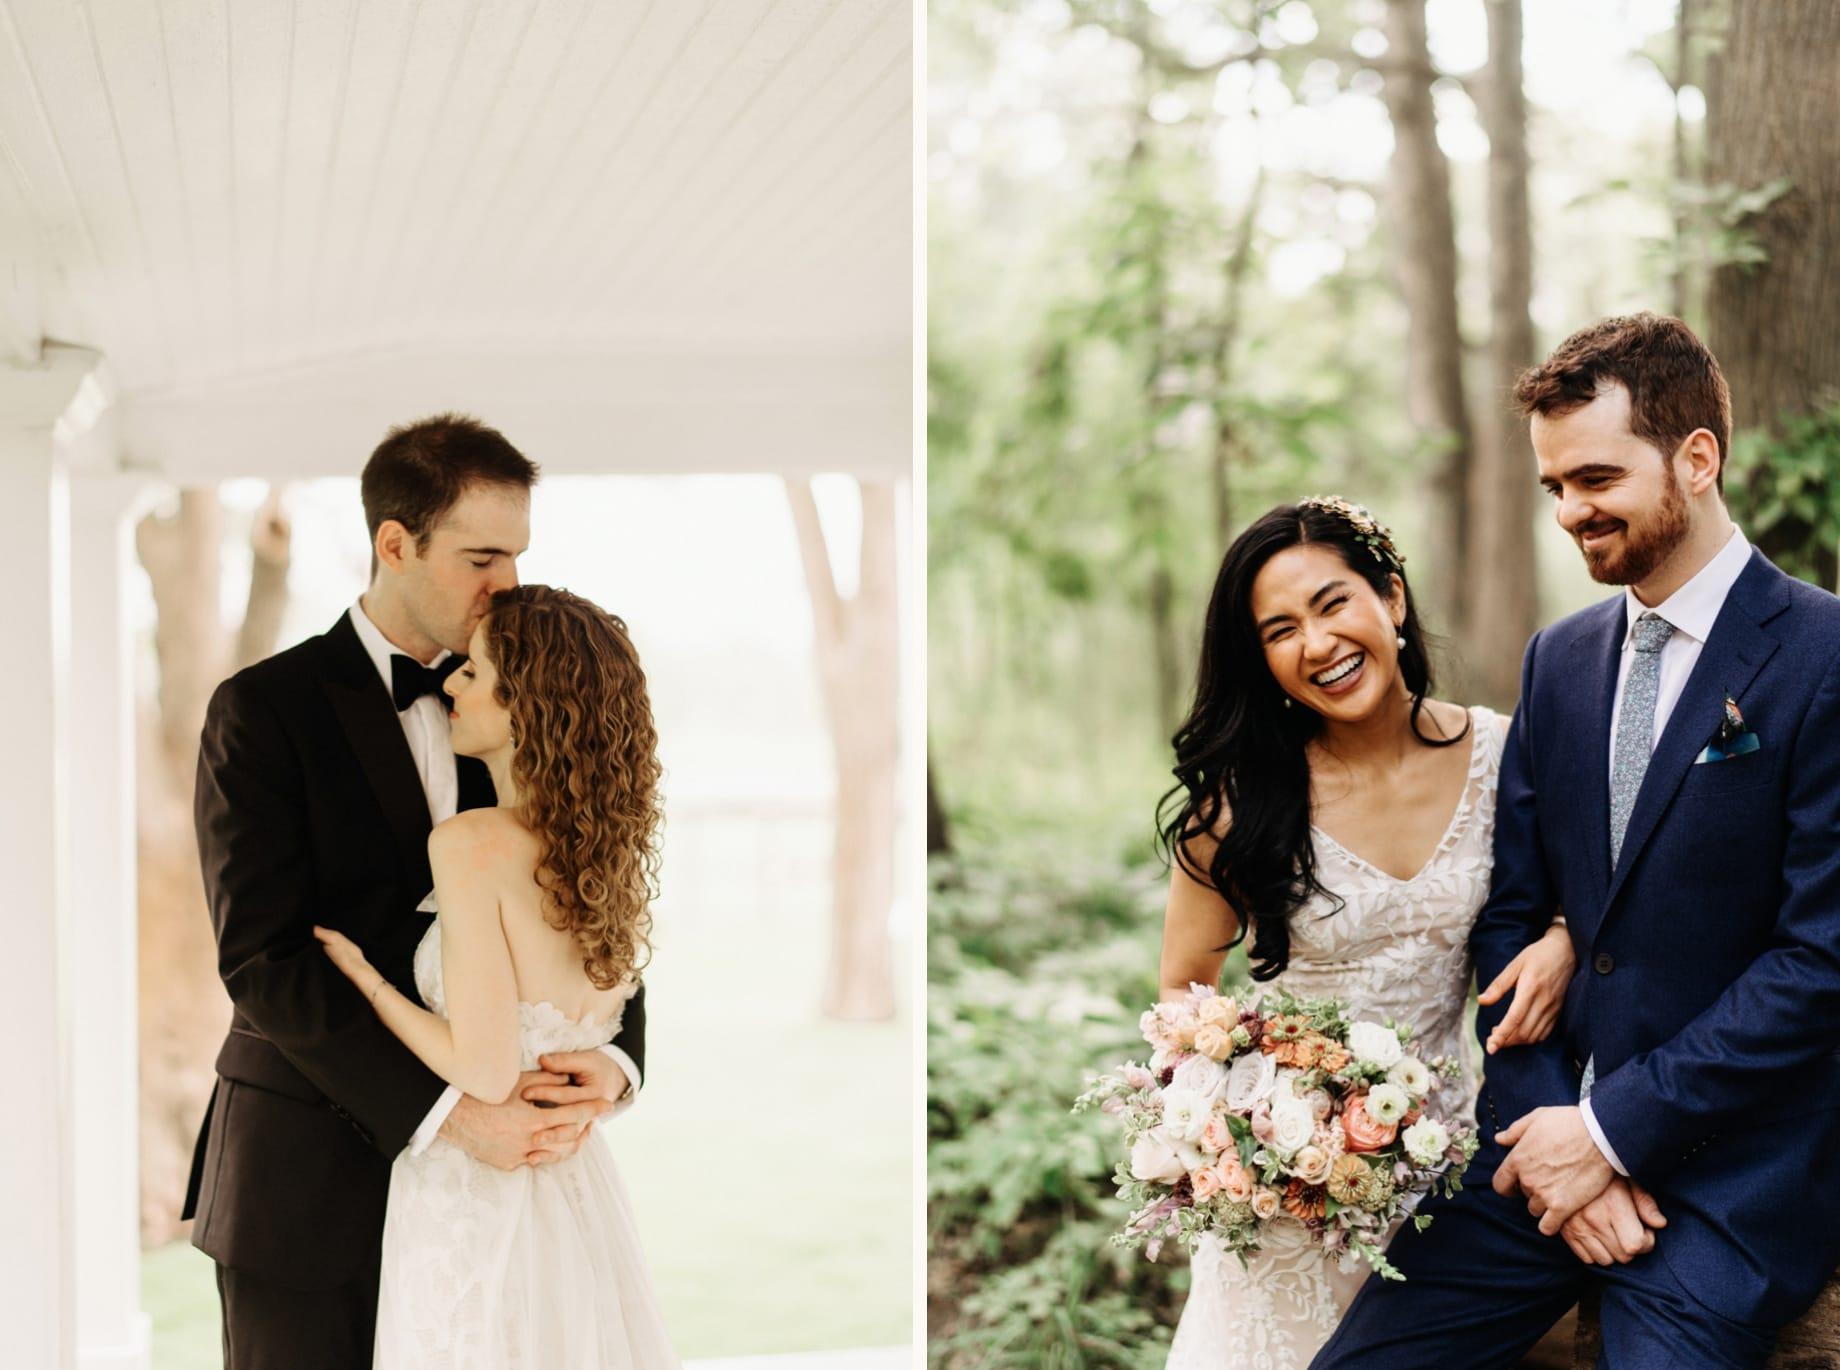 detroit wedding photographer Heather Jowett Best of 2019